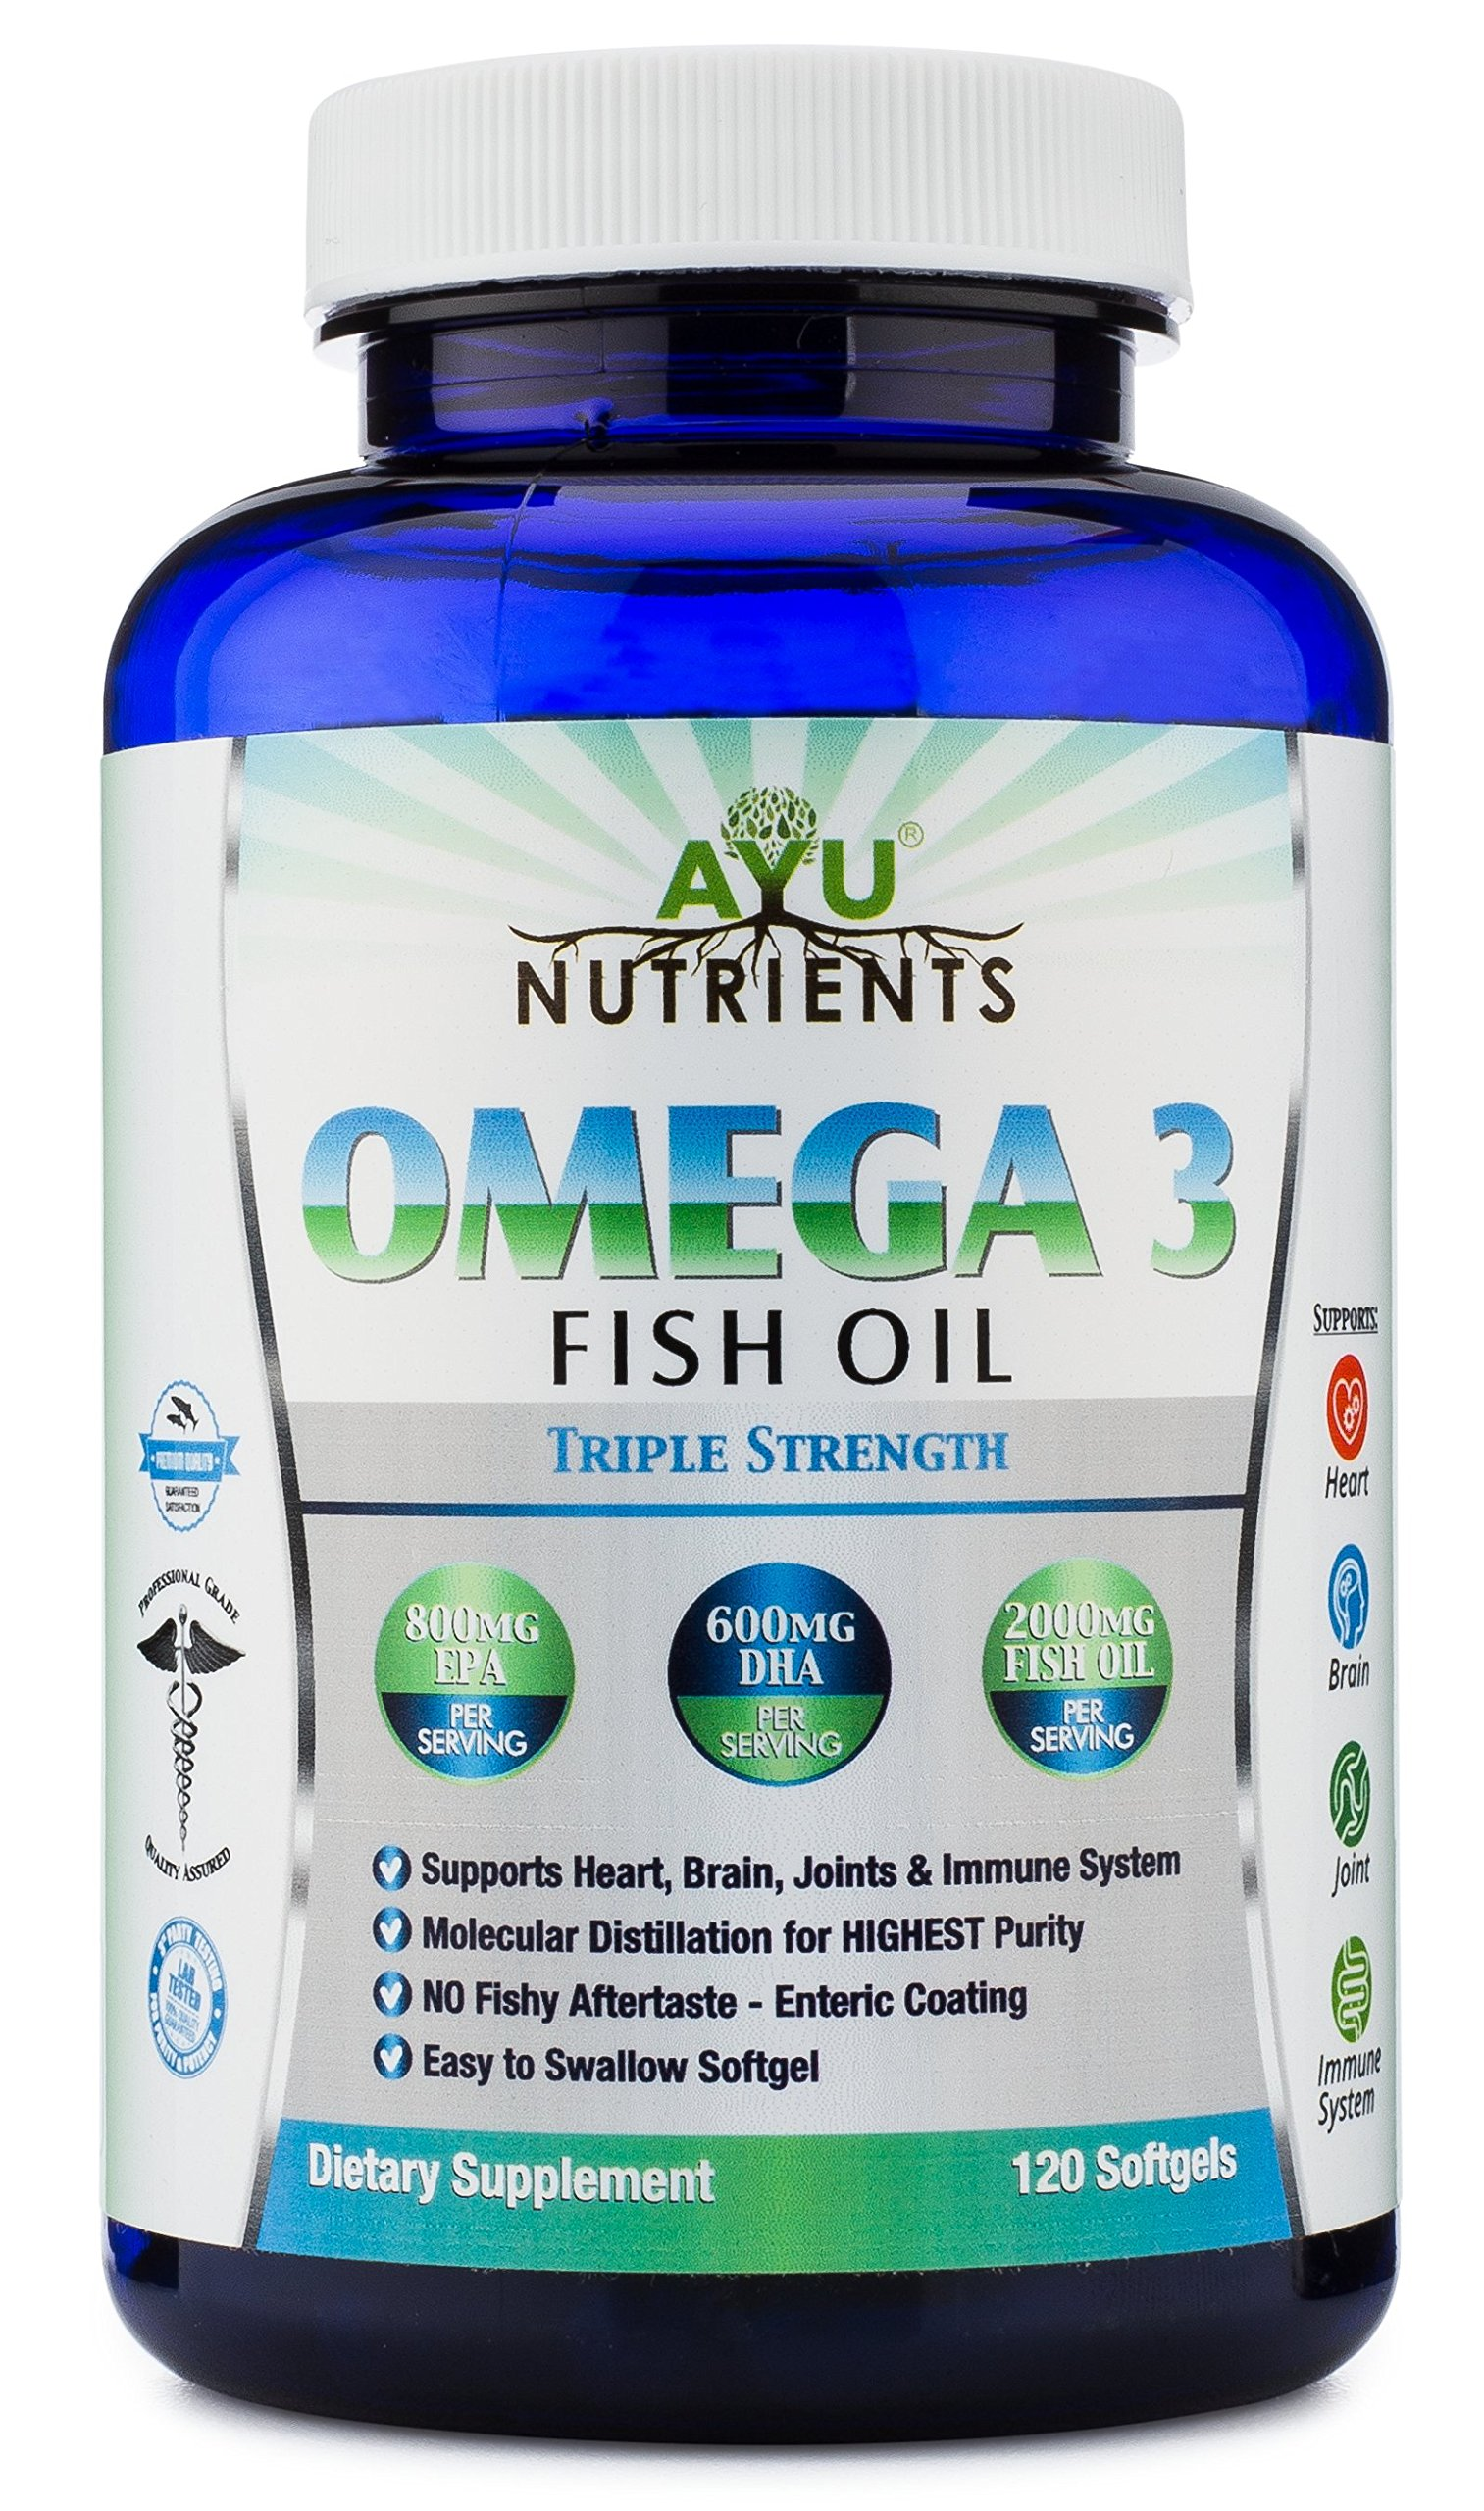 Omega 3 Fish Oil Triple Strength 100% Pure Sea Harvested Fish Oil /Natural Essential Fatty Acids - High EPA (800 mg) High DHA (600mg)! 60/120/180 Softgels (120)